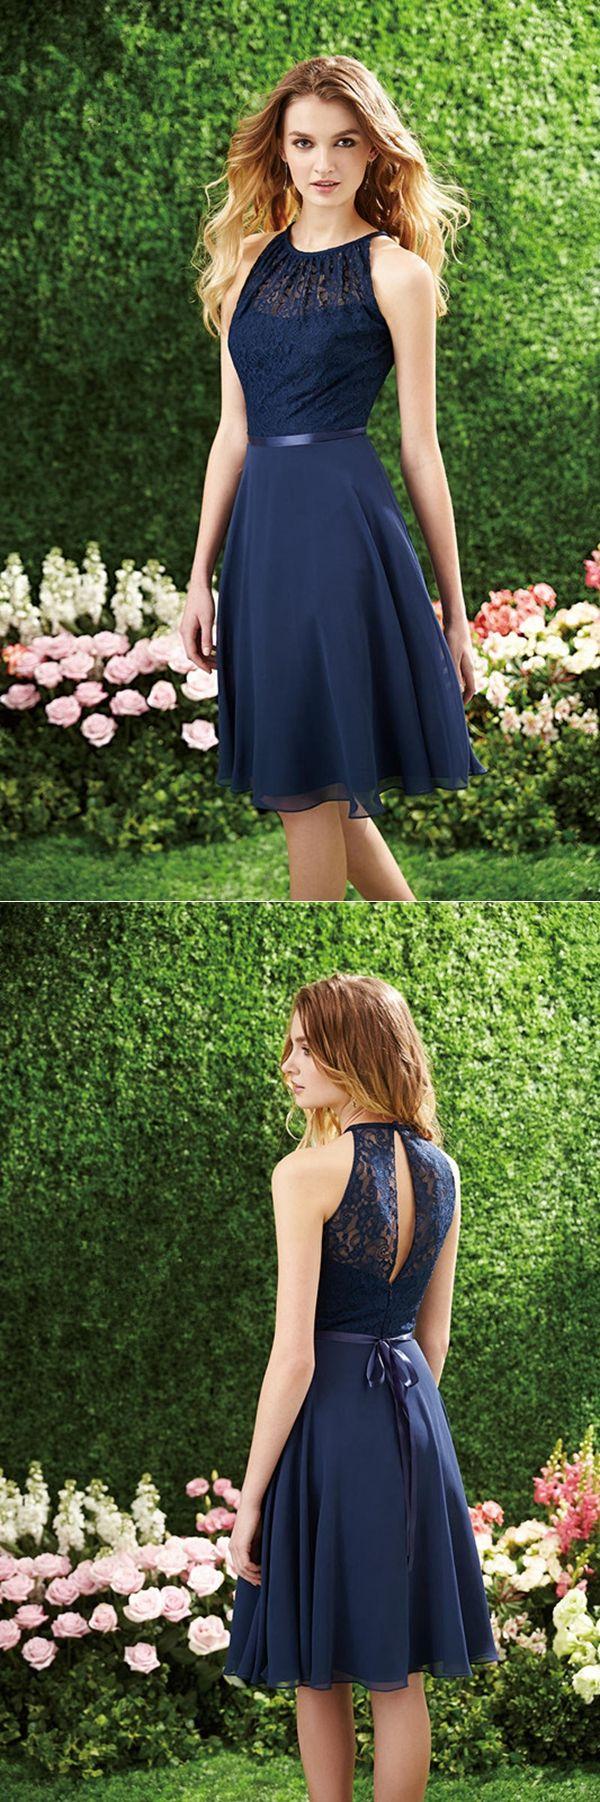 bridesmaid dress style 779 monitor